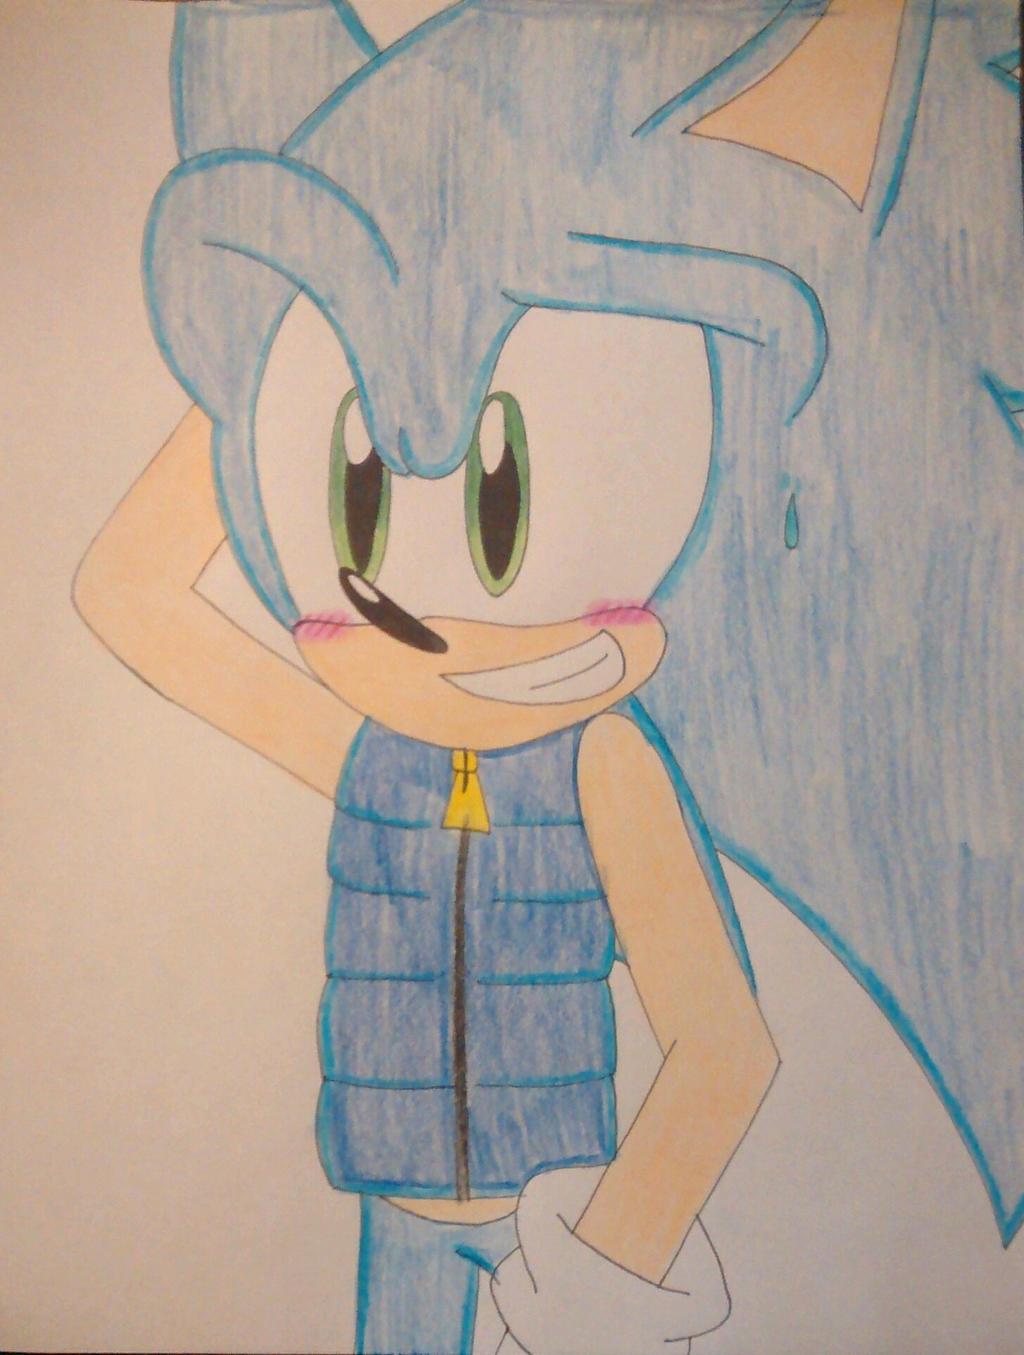 Sonic In A Life Jacket By Sonicgirlfriend65 On Deviantart